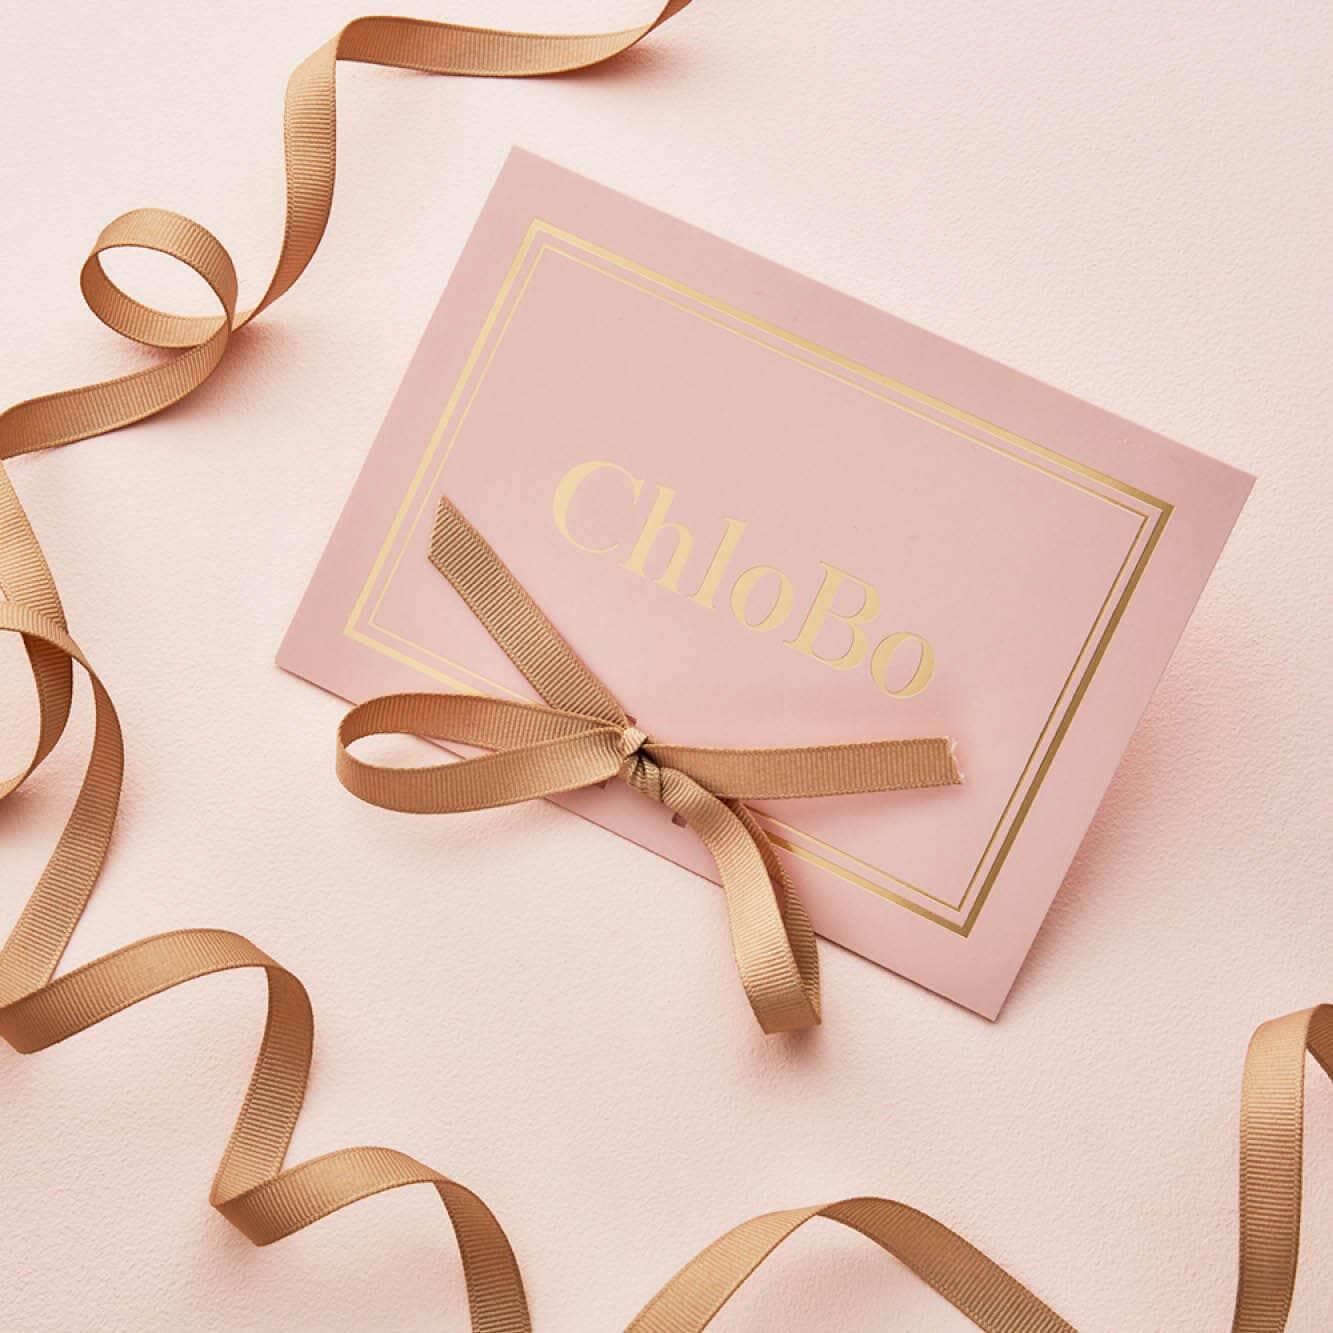 ChloBo Gift Vouchers